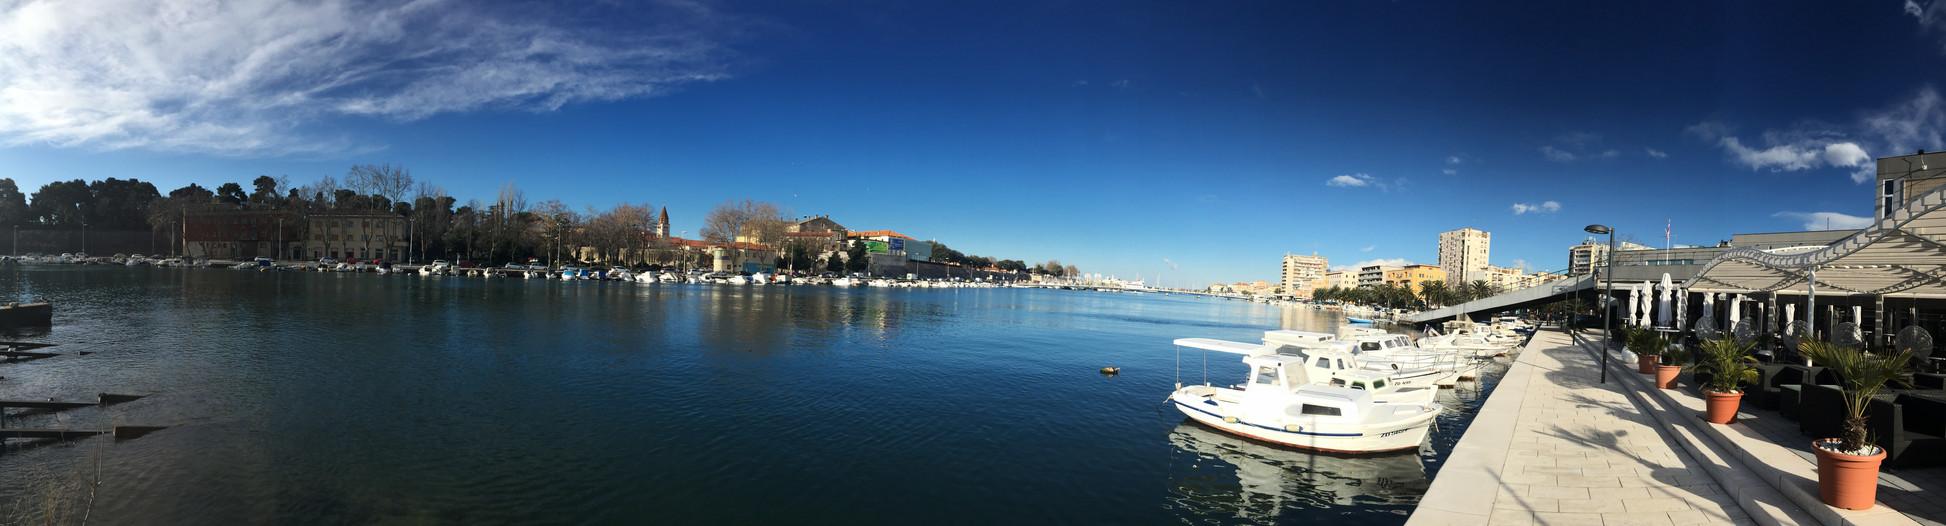 Zadar - panorama from the Harobour Caffee